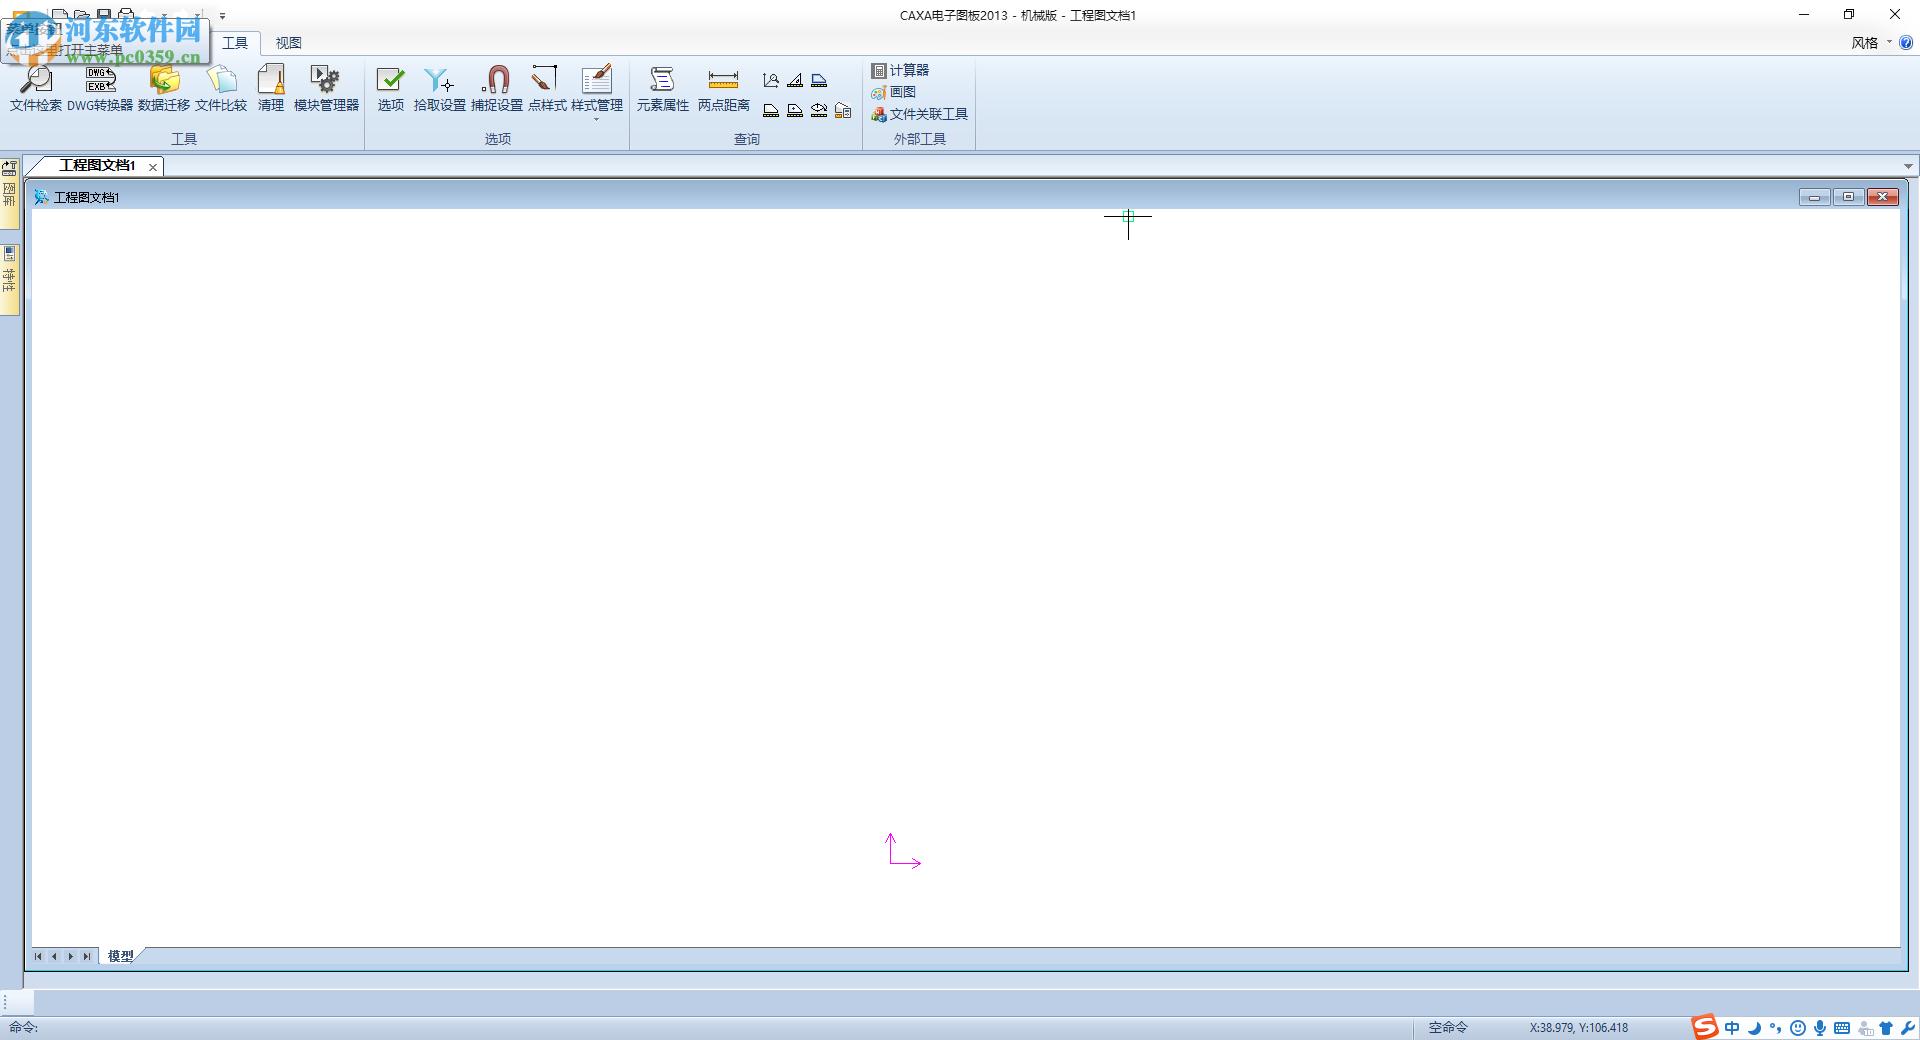 caxa2013设置绘图背景为白底的方法